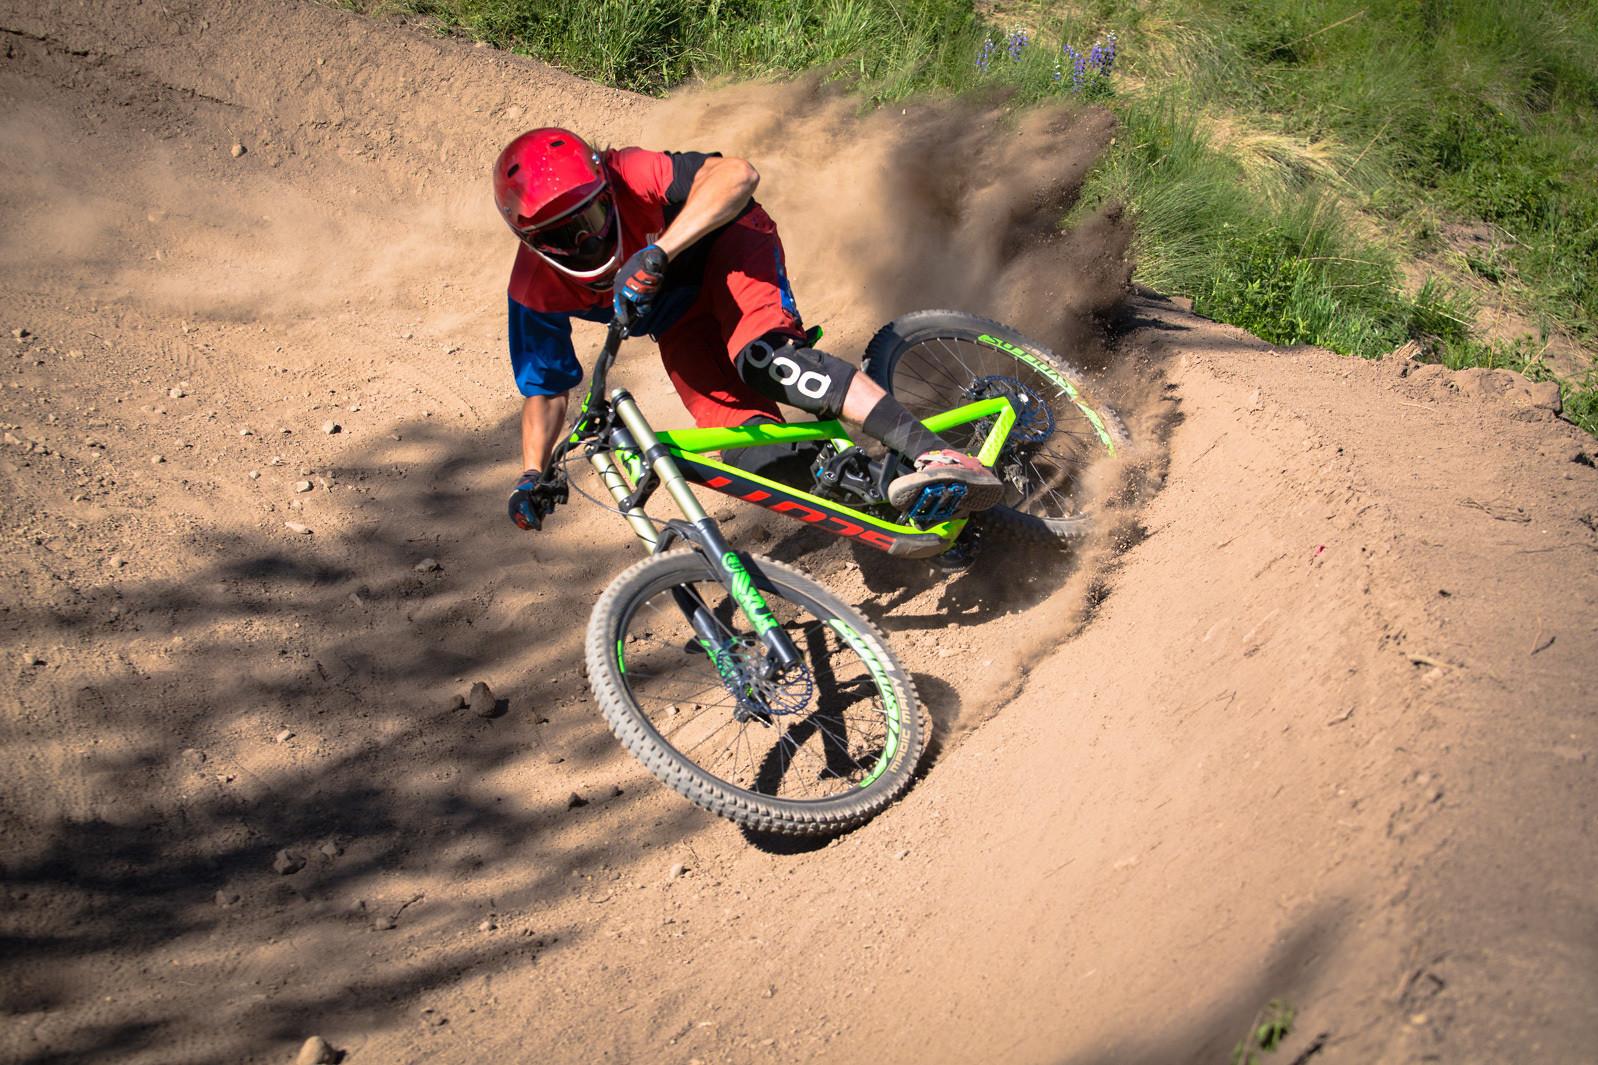 Berm Blowout - Evolution Bike Park - Mountain Biking Pictures - Vital MTB